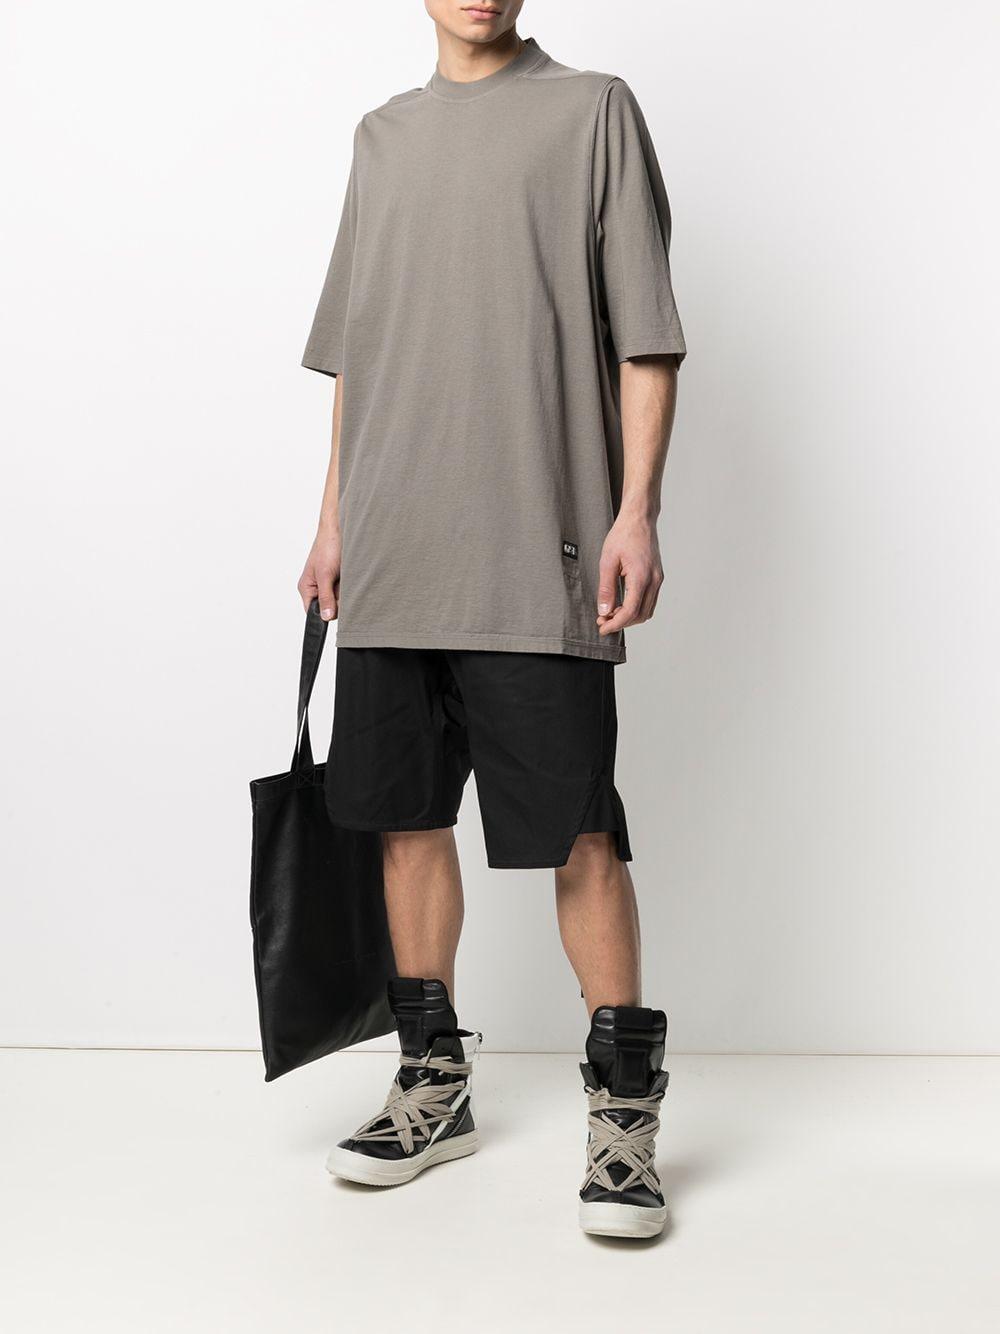 Rick Owens Drkshdw t-shirt oversize uomo RICK OWENS DRKSHDW | T-shirt | DU21S2274 RN34